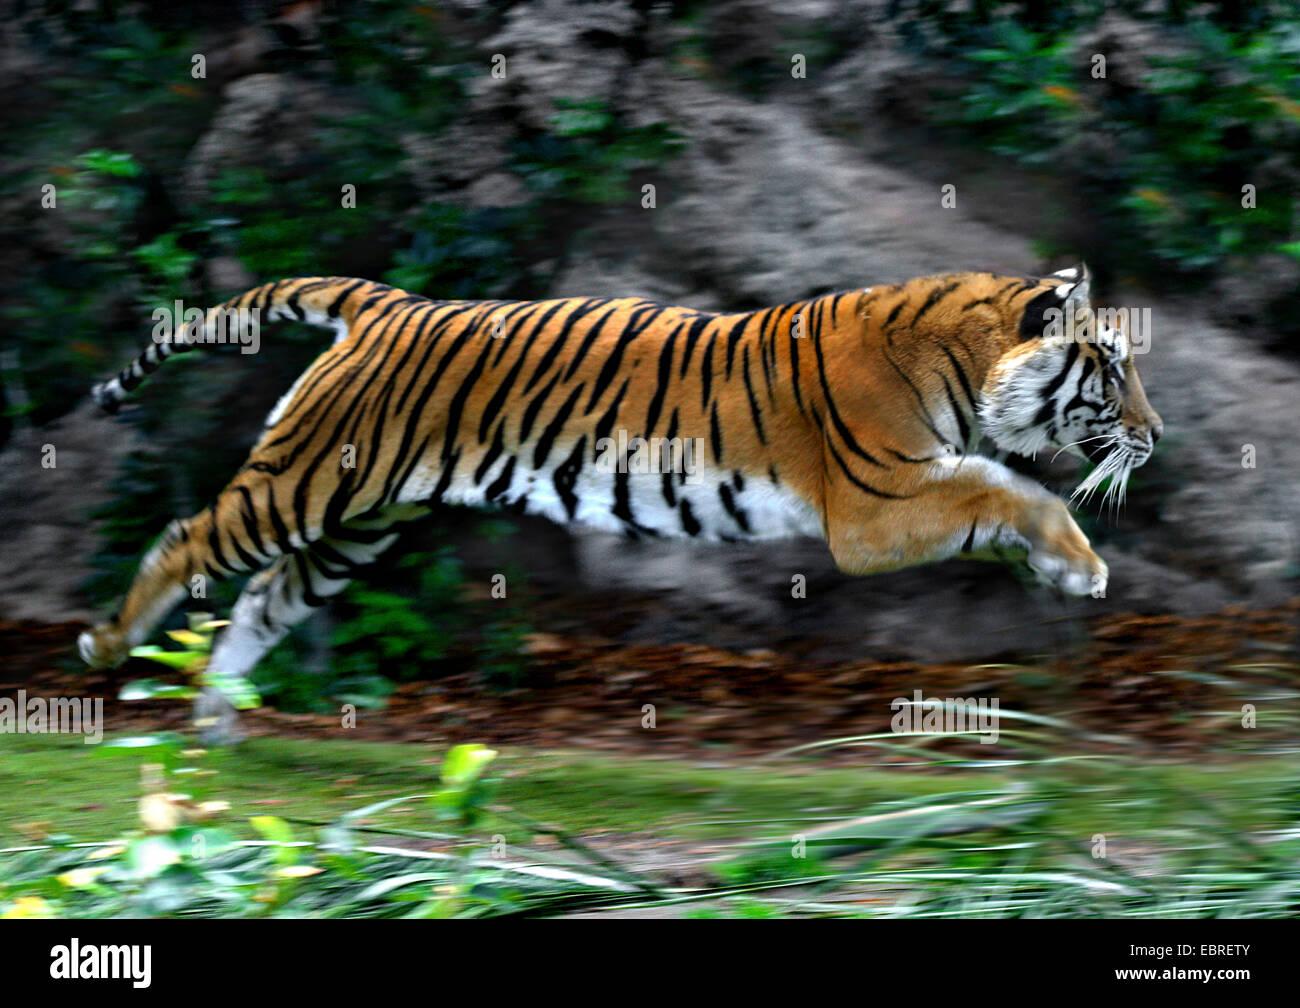 El tigre (Panthera tigris), salto lateral, acción Imagen De Stock